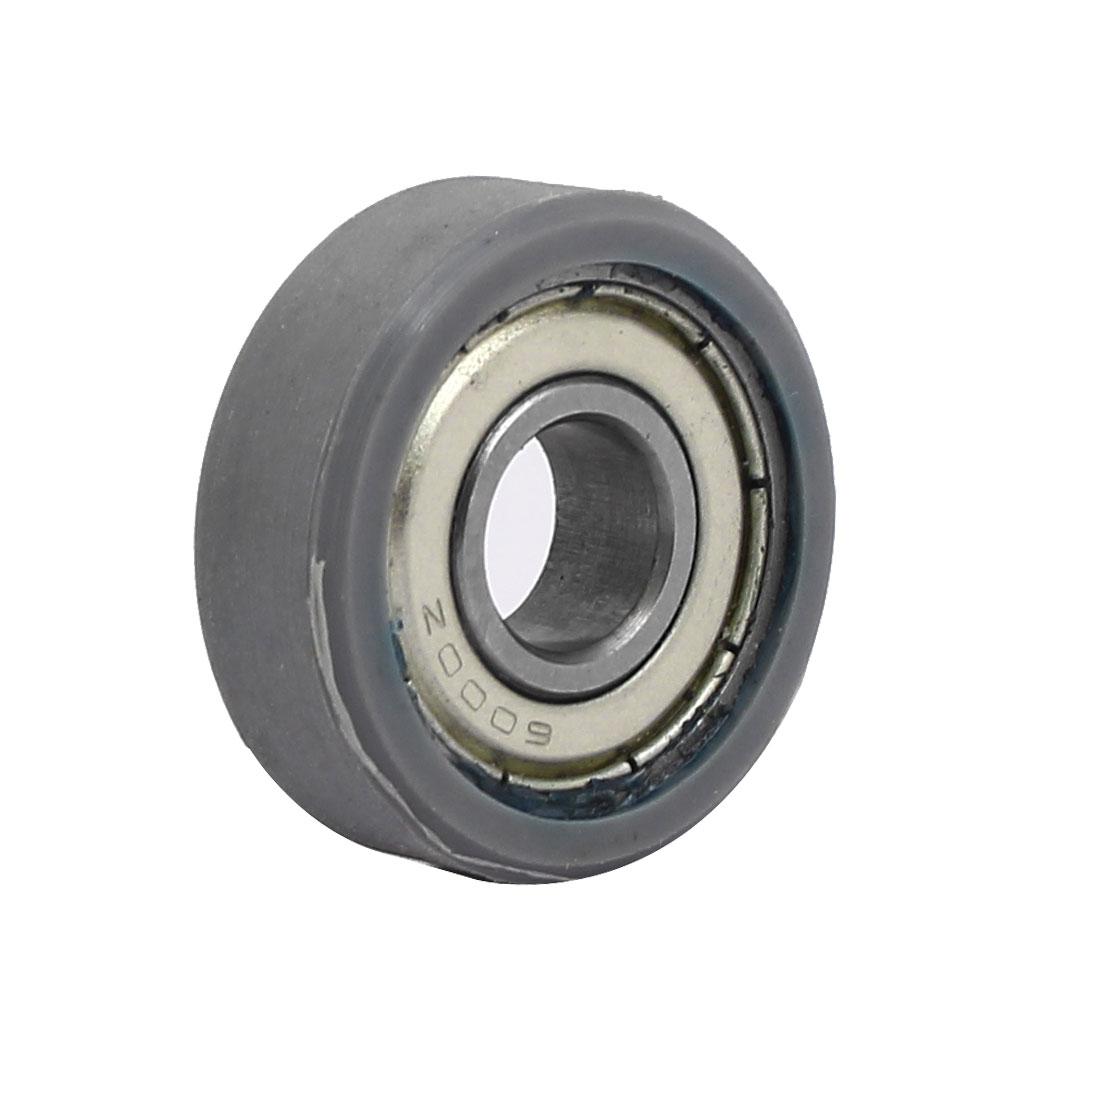 10mm x 30mm x 10mm PU Roller Bearing Pulley Sliding Converyor Wheel